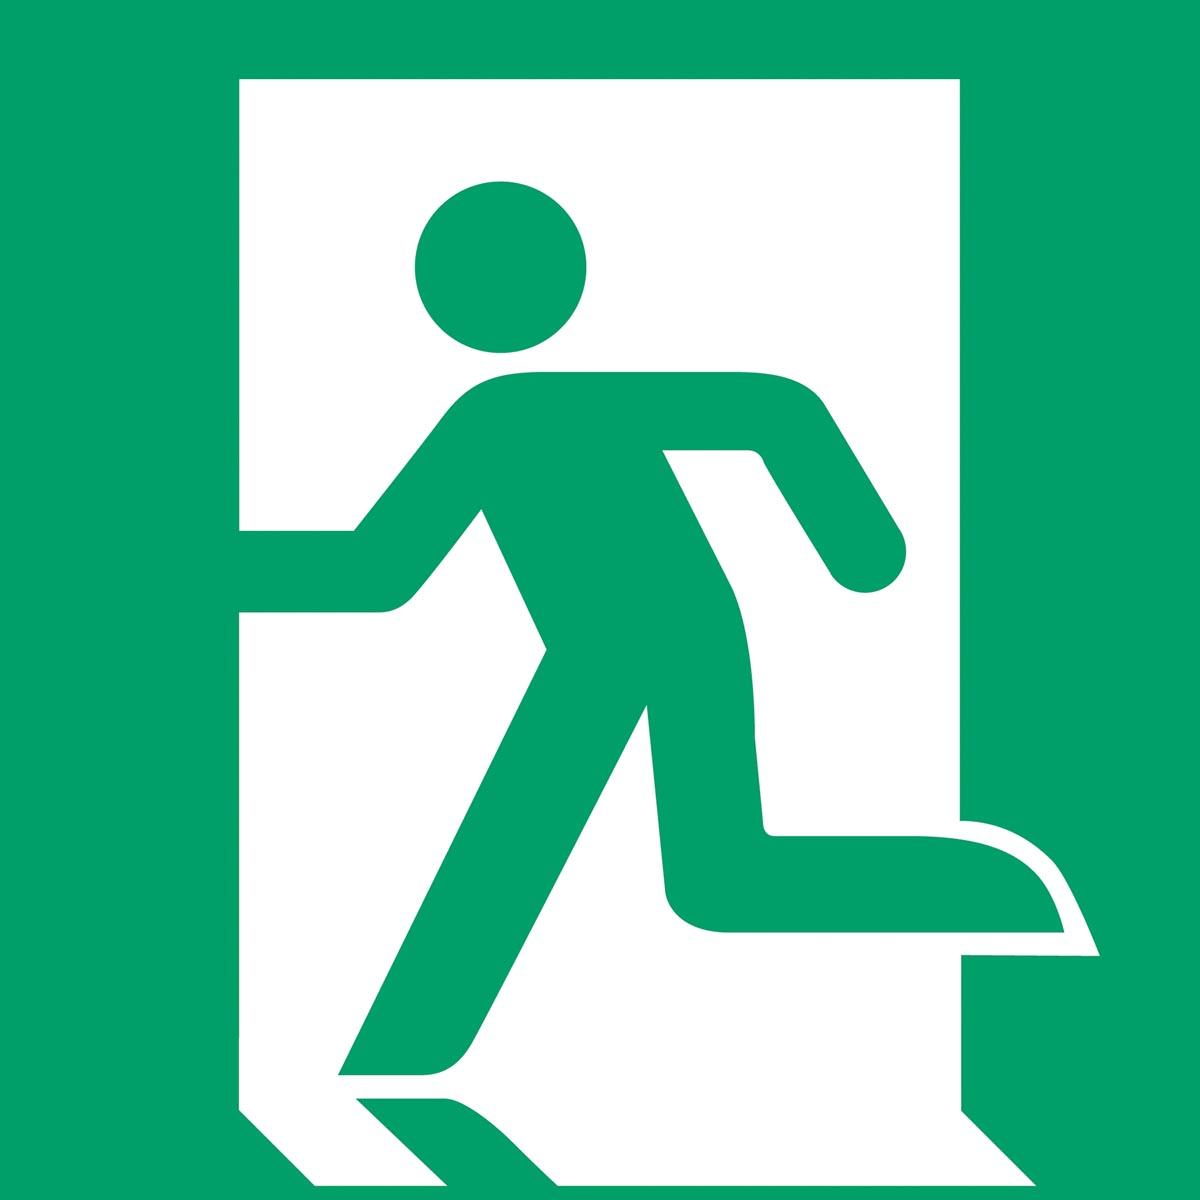 Tarifold evacuatiebord uit PP, nooduitgang links, ft 20 x 20 cm